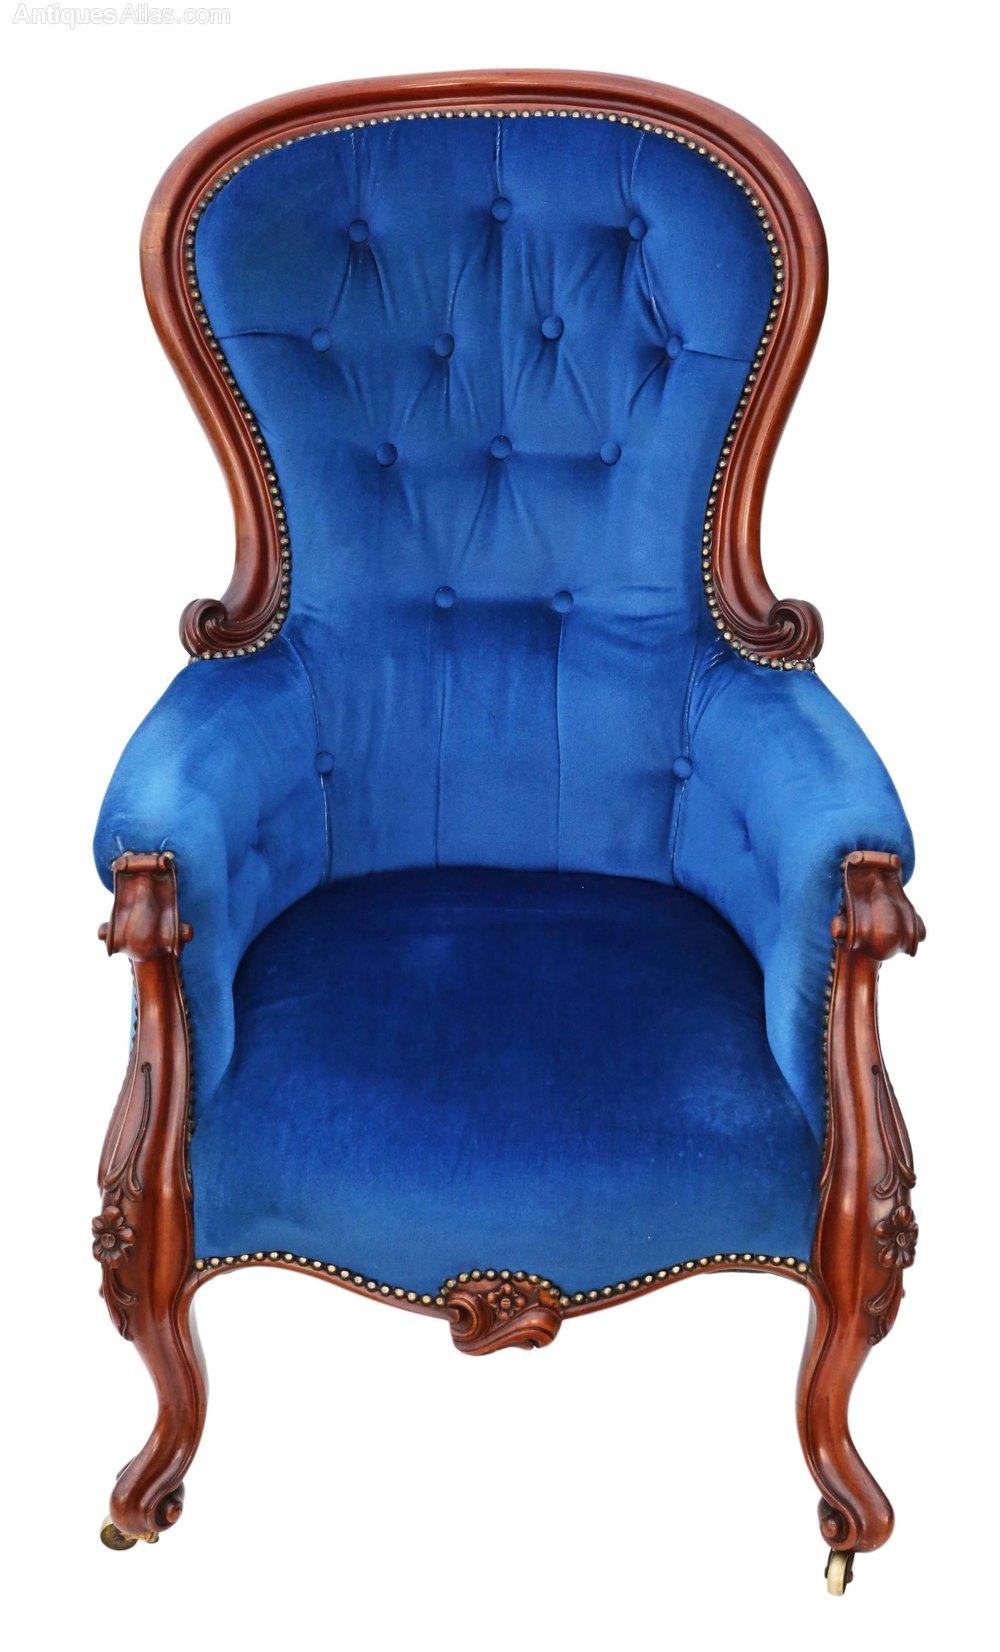 Victorian Mahogany Spoon Back Armchair Slipper - Antiques ...